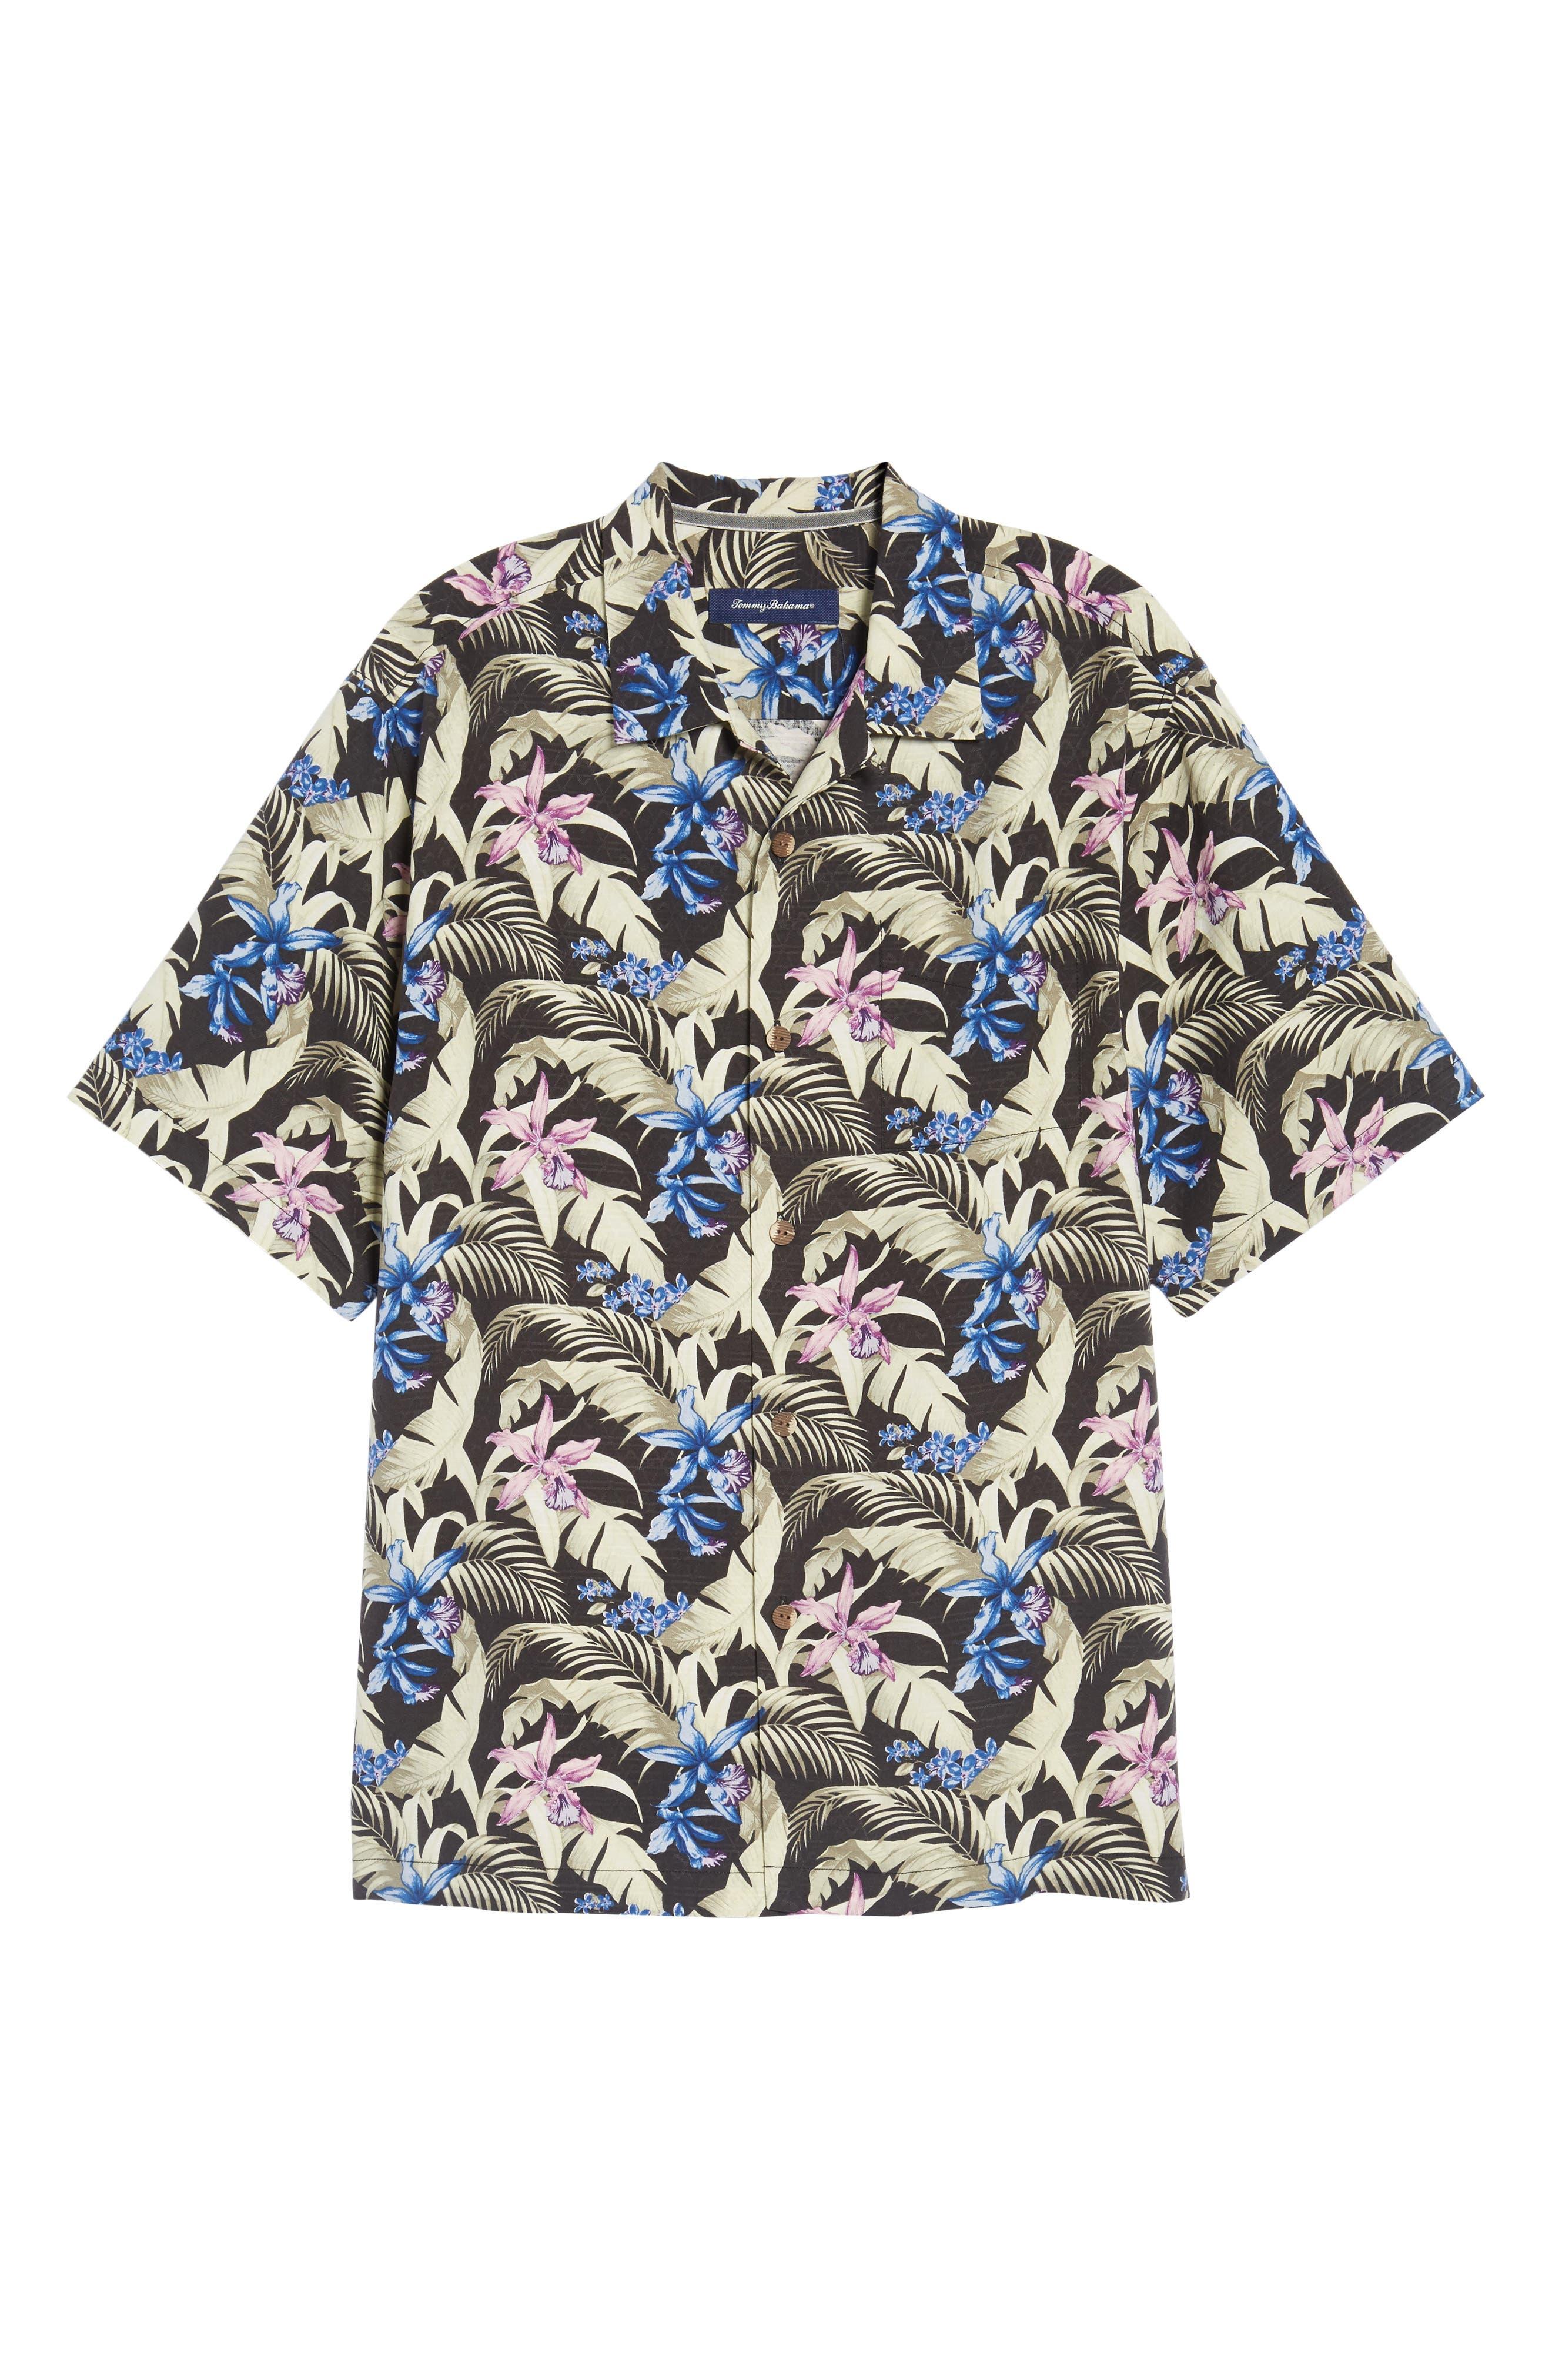 Menara Garden Standard Fit Silk Camp Shirt,                             Alternate thumbnail 6, color,                             001